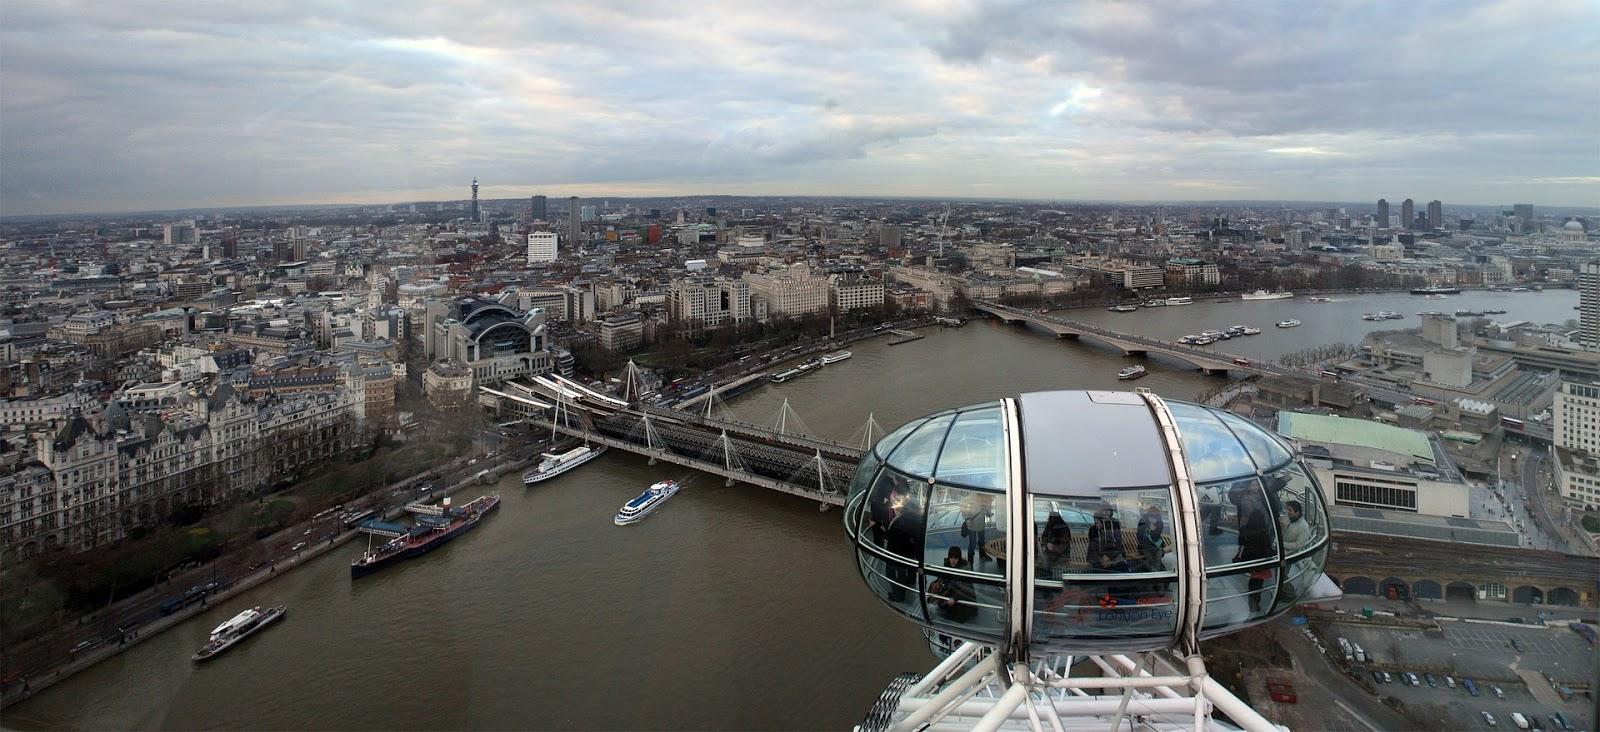 London Eyen maisemaa Lontoon yli.